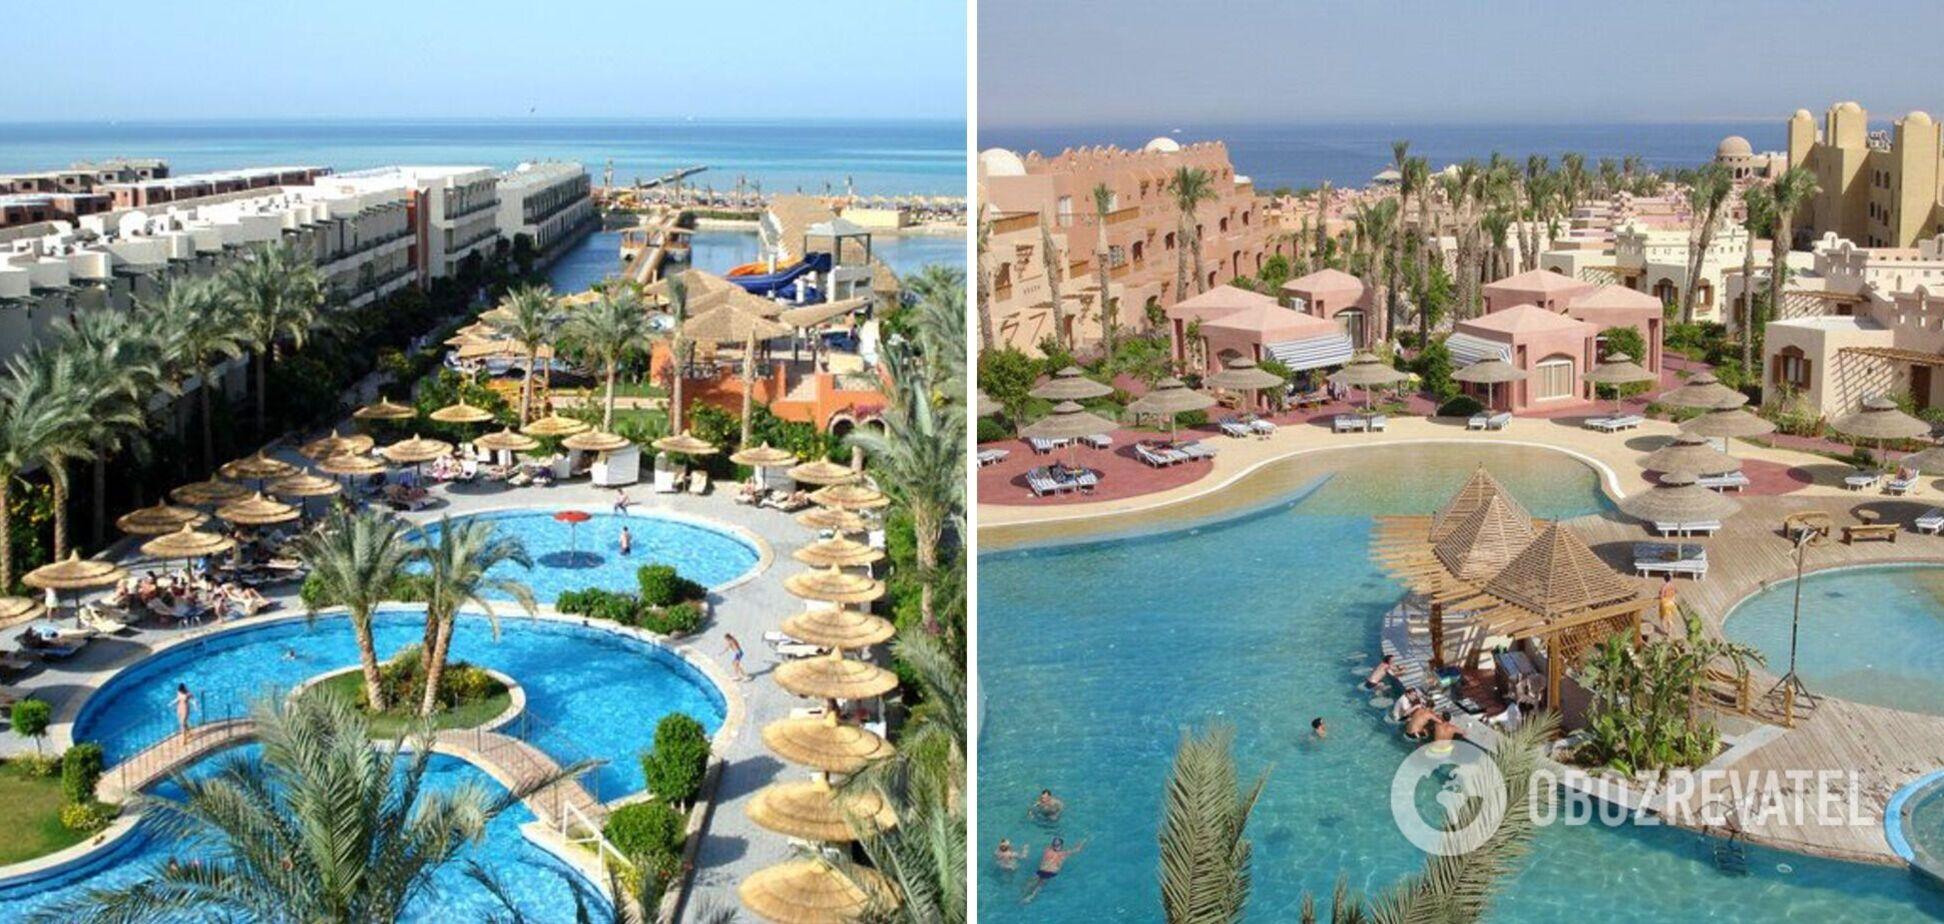 Курорты Египта: Хургада и Шарм-эль-Шейх